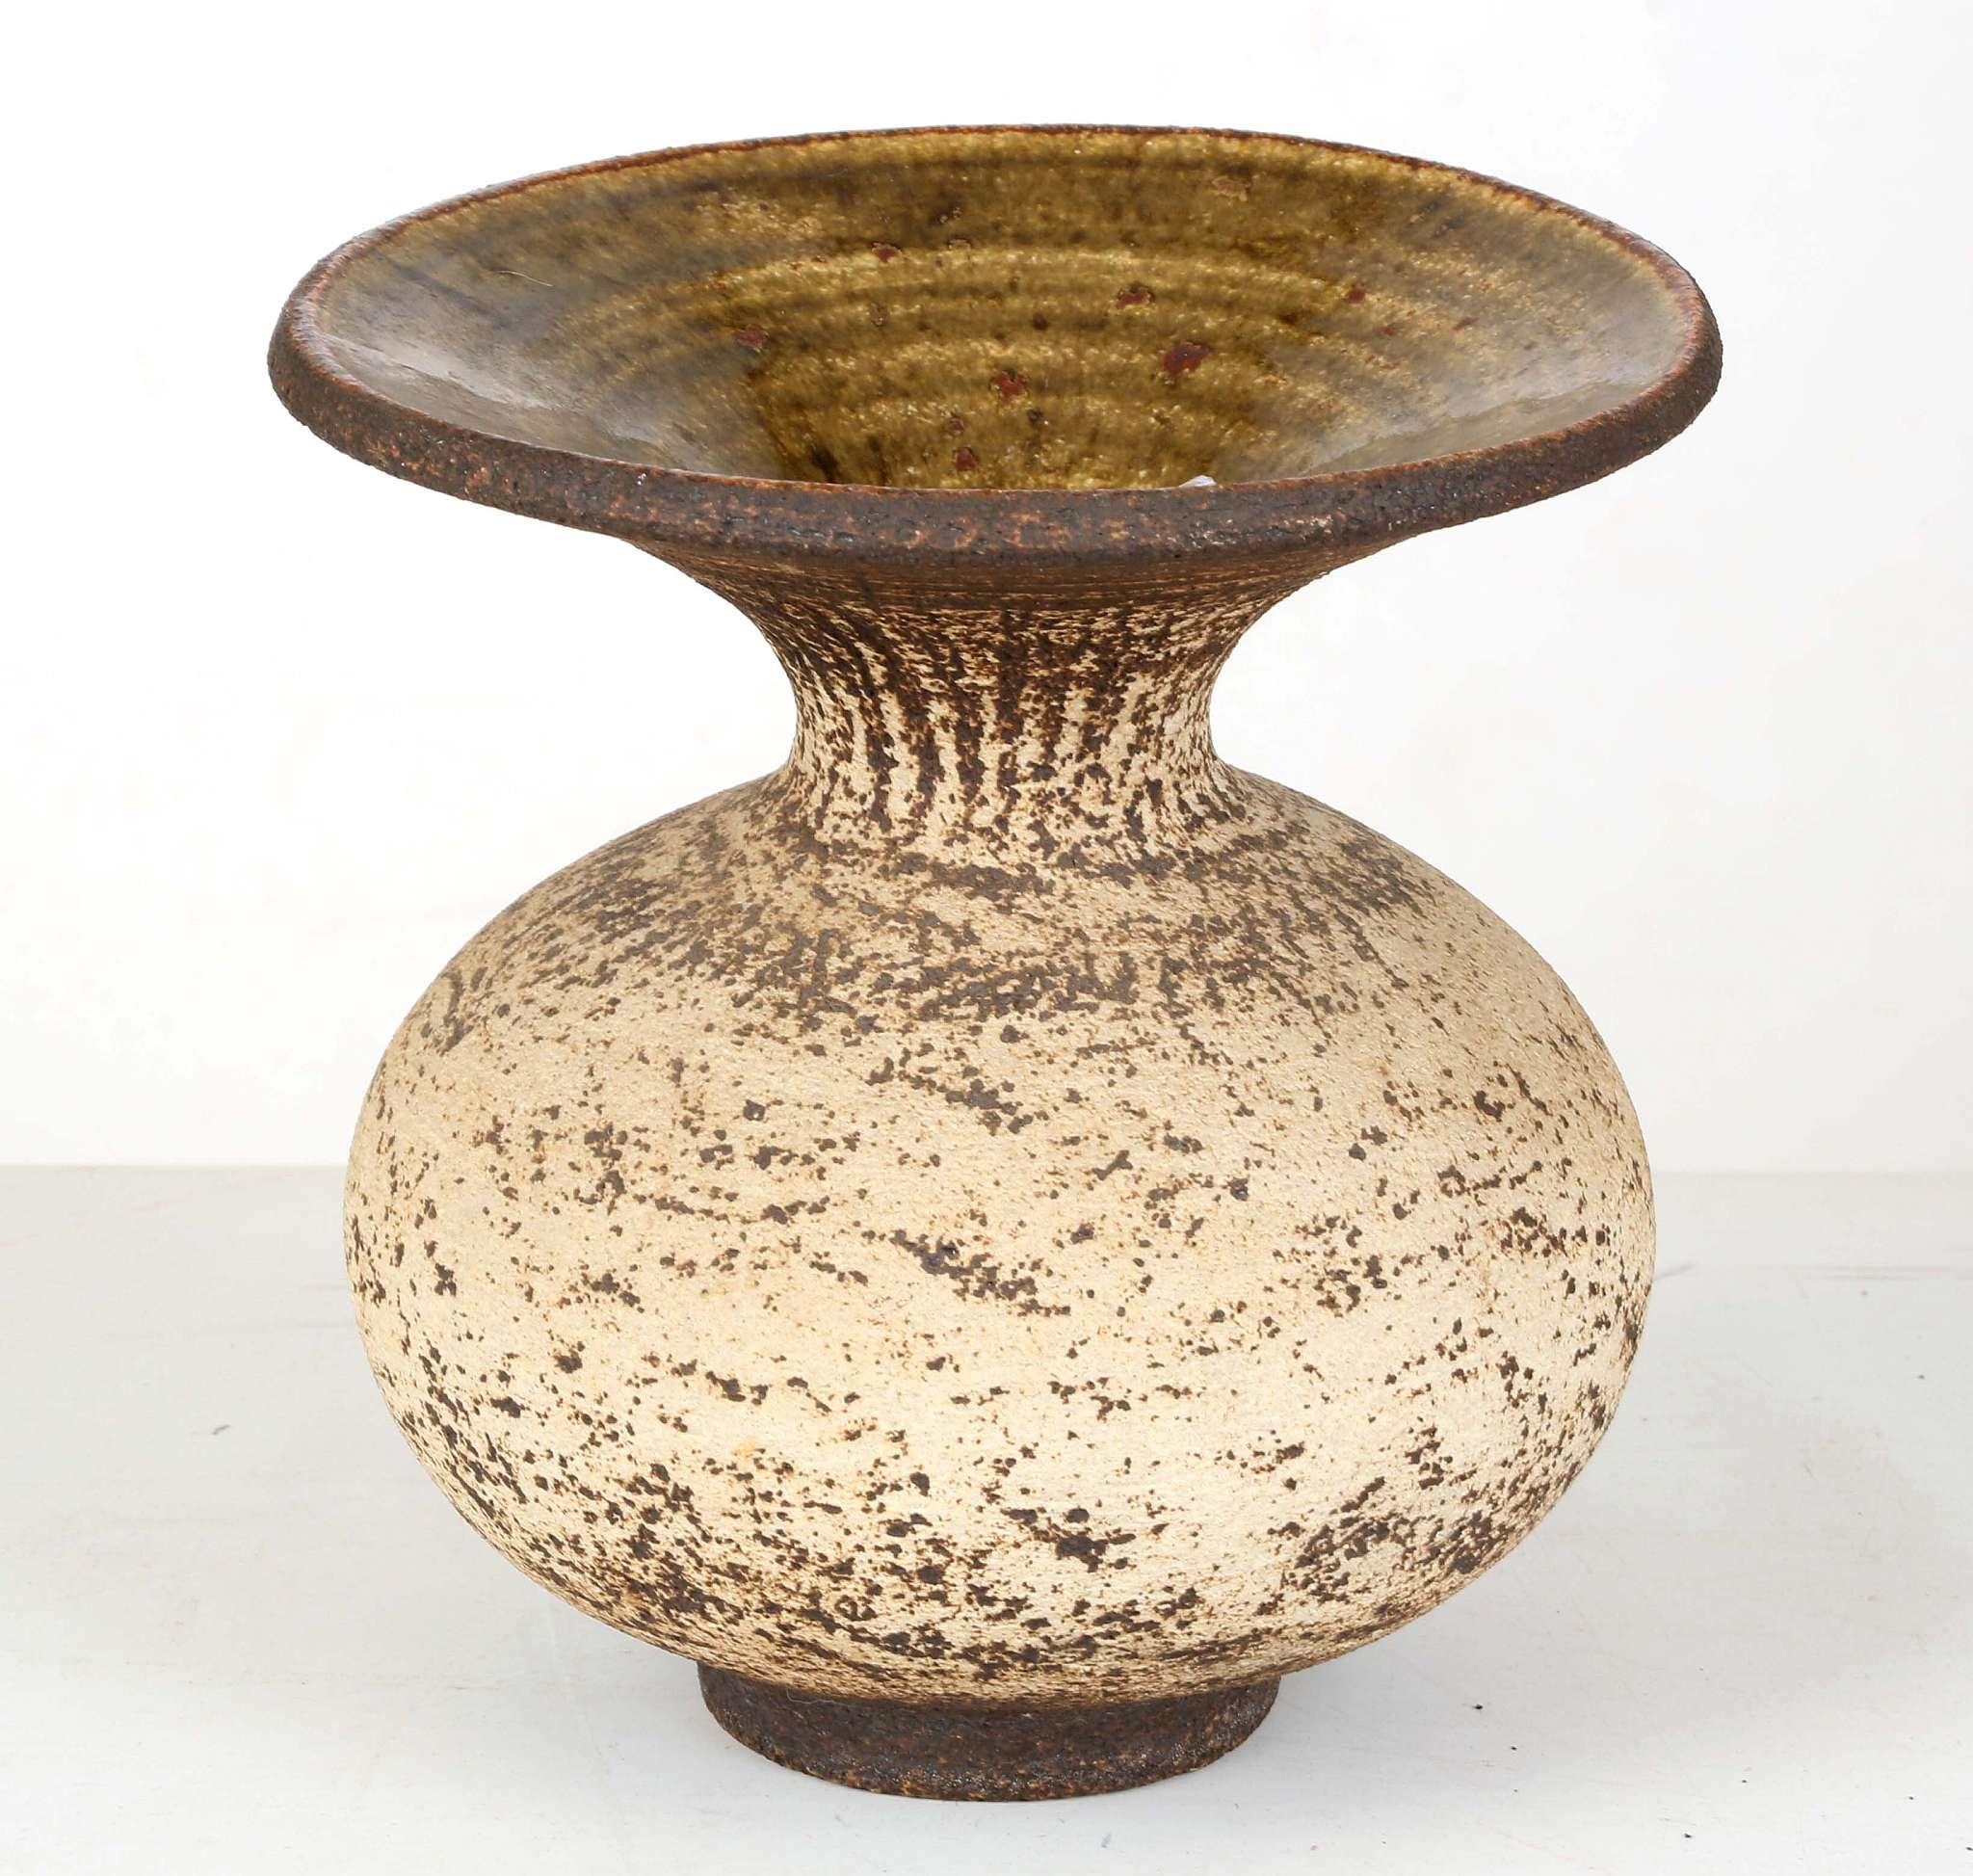 Waistel cooper a stoneware studio pottery vase textured body lot 204 waistel cooper a stoneware studio pottery vase t reviewsmspy